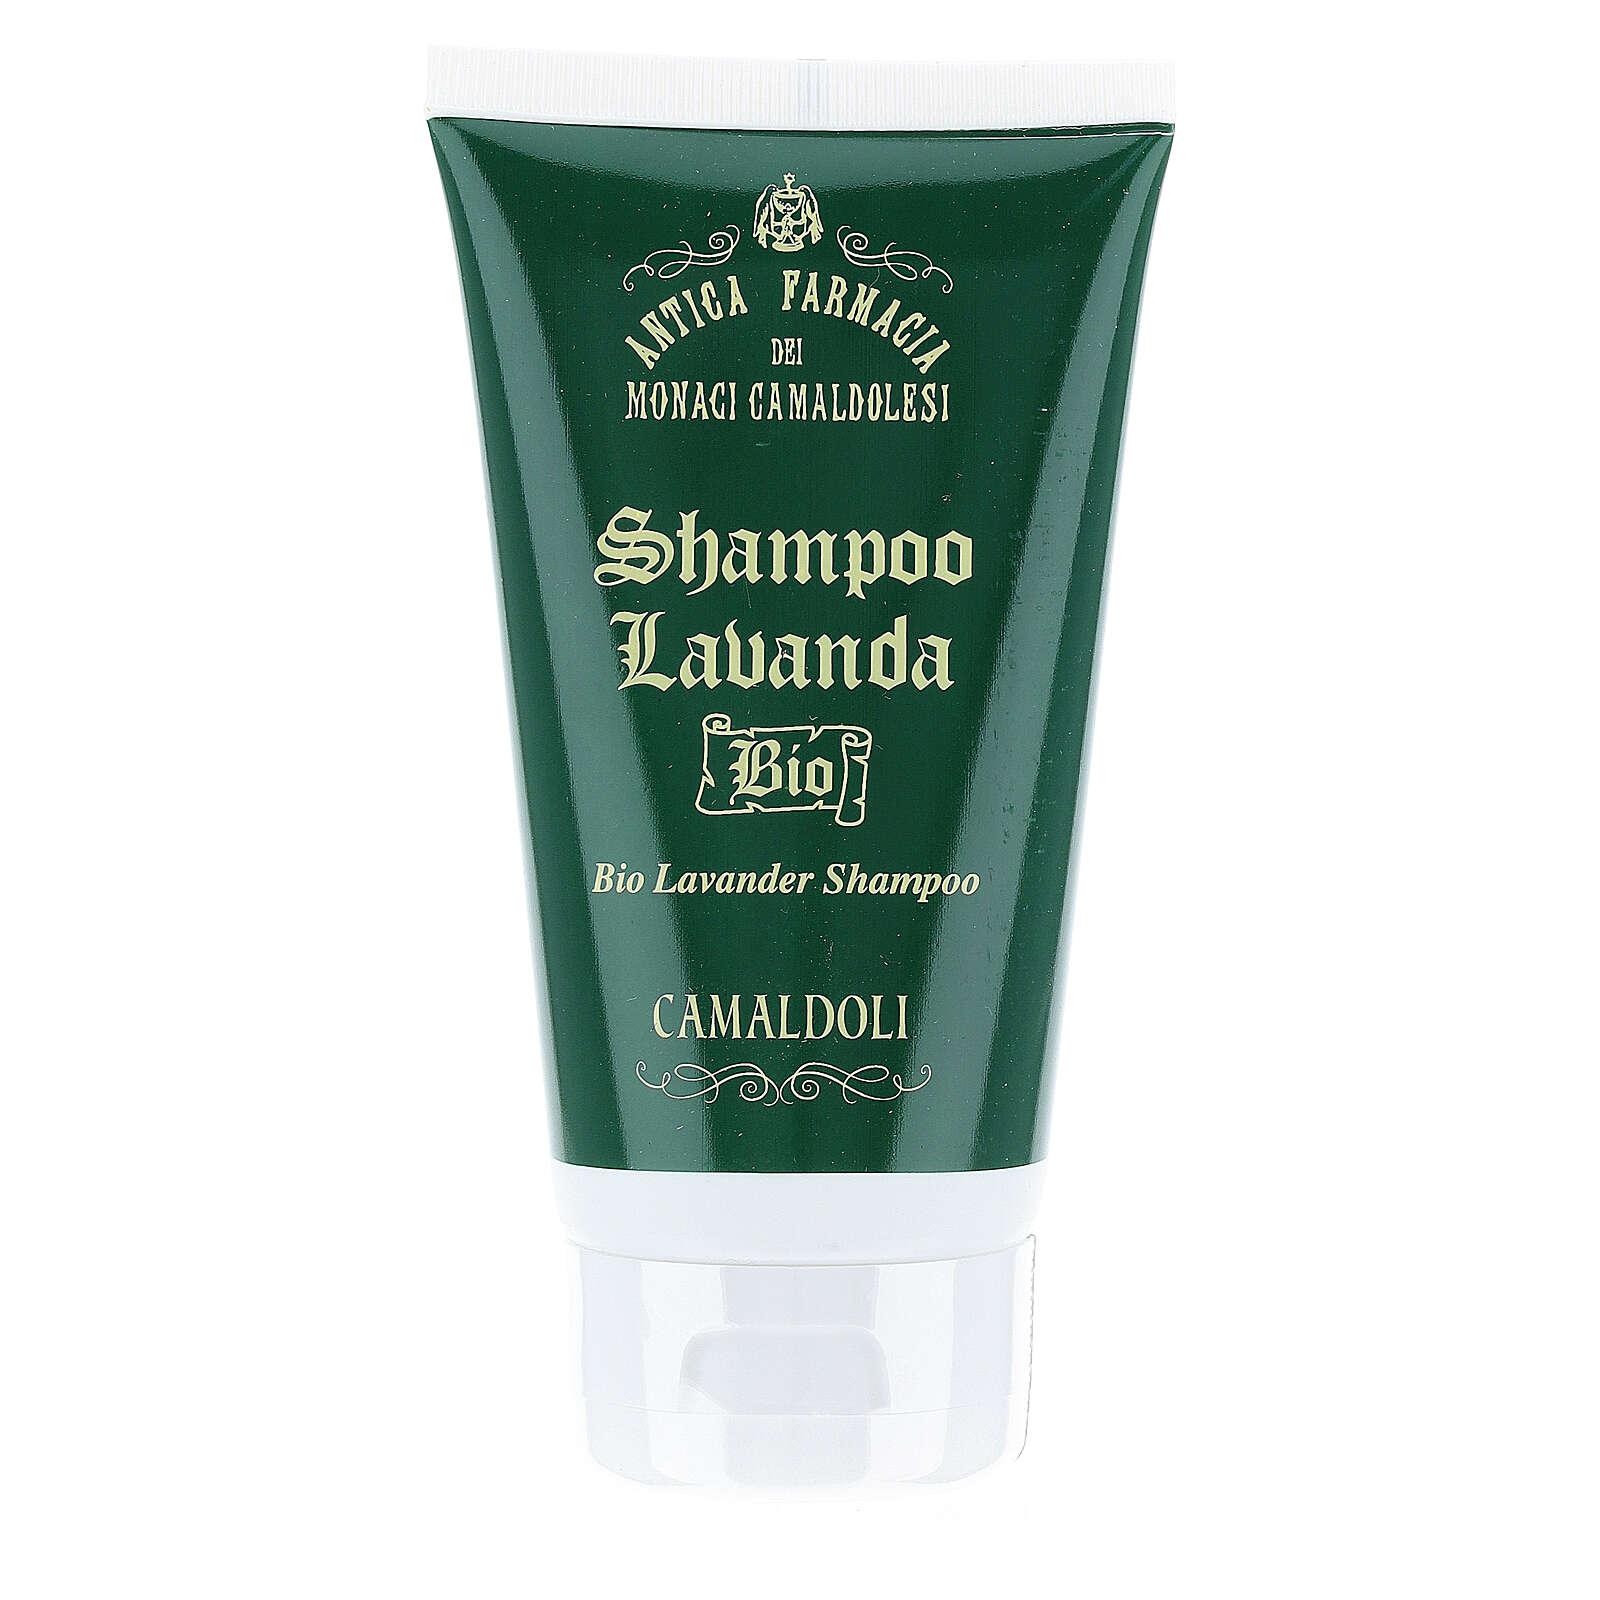 Shampoing Lavande Bio BDIH 150 ml Camaldoli 4